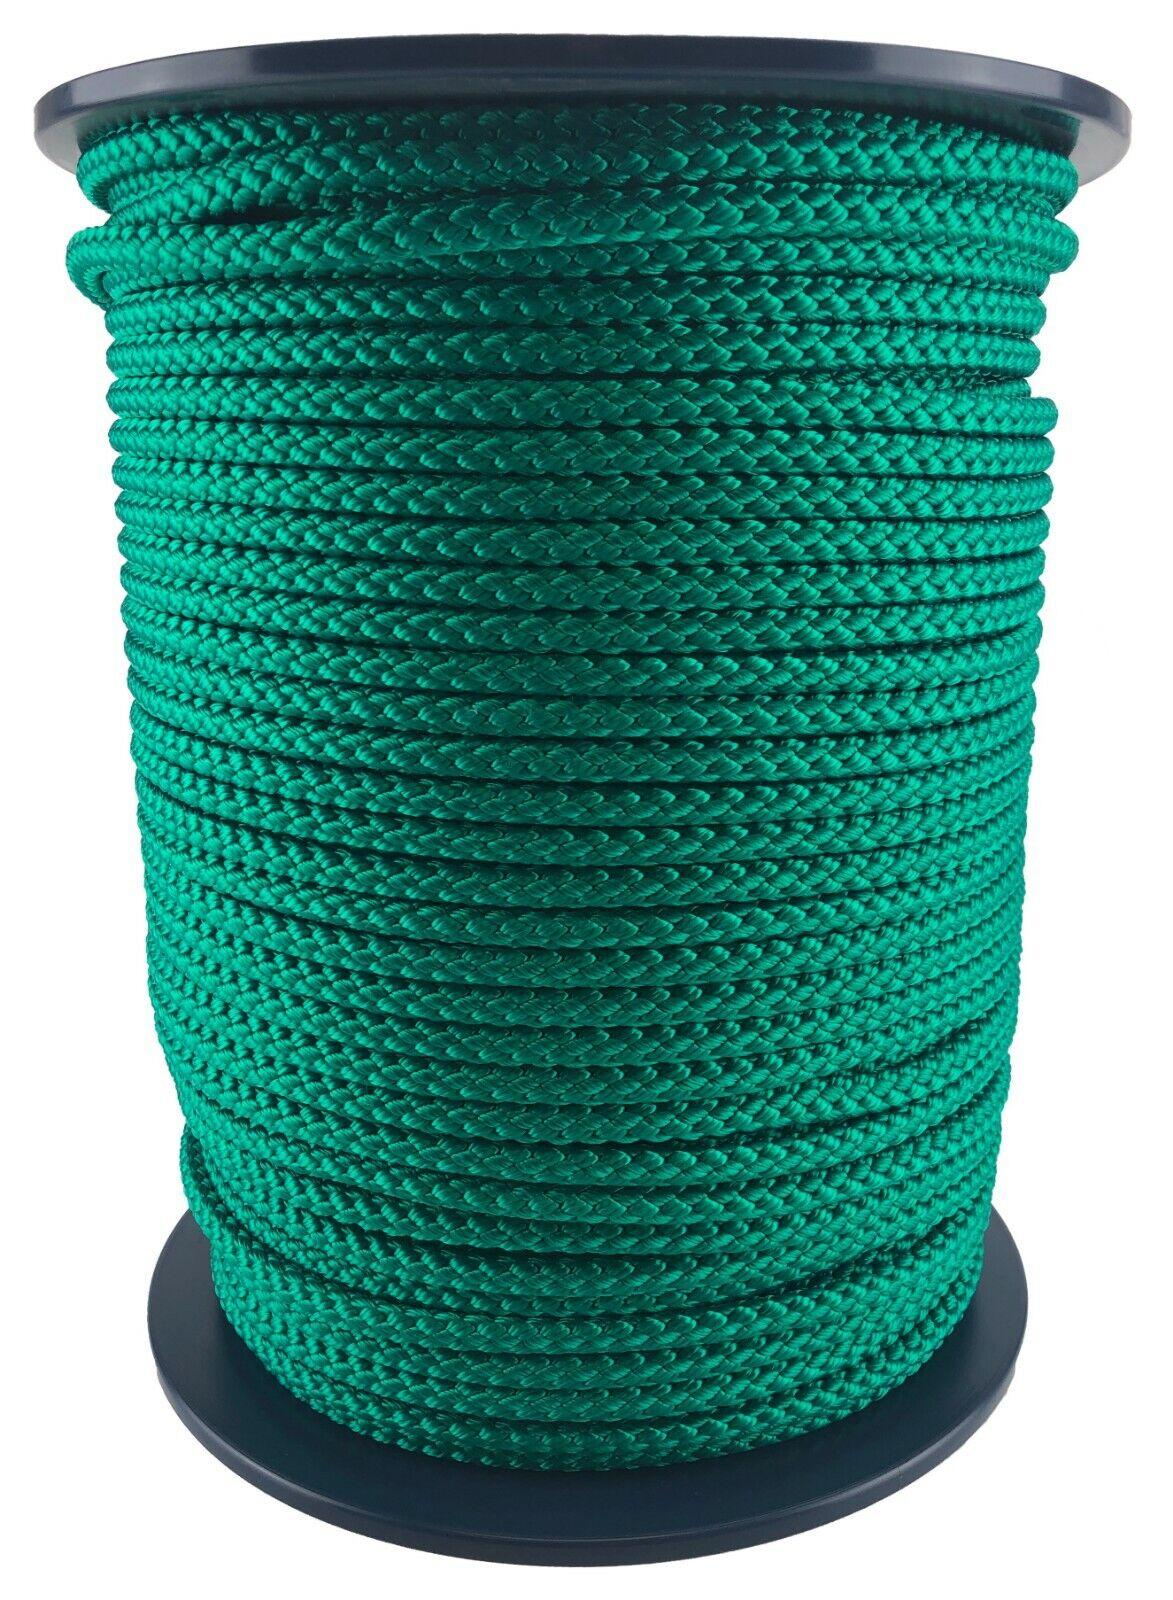 12mm Green Braided Polypropylene Rope x 45 Metres, Paracord Drawstring Camping